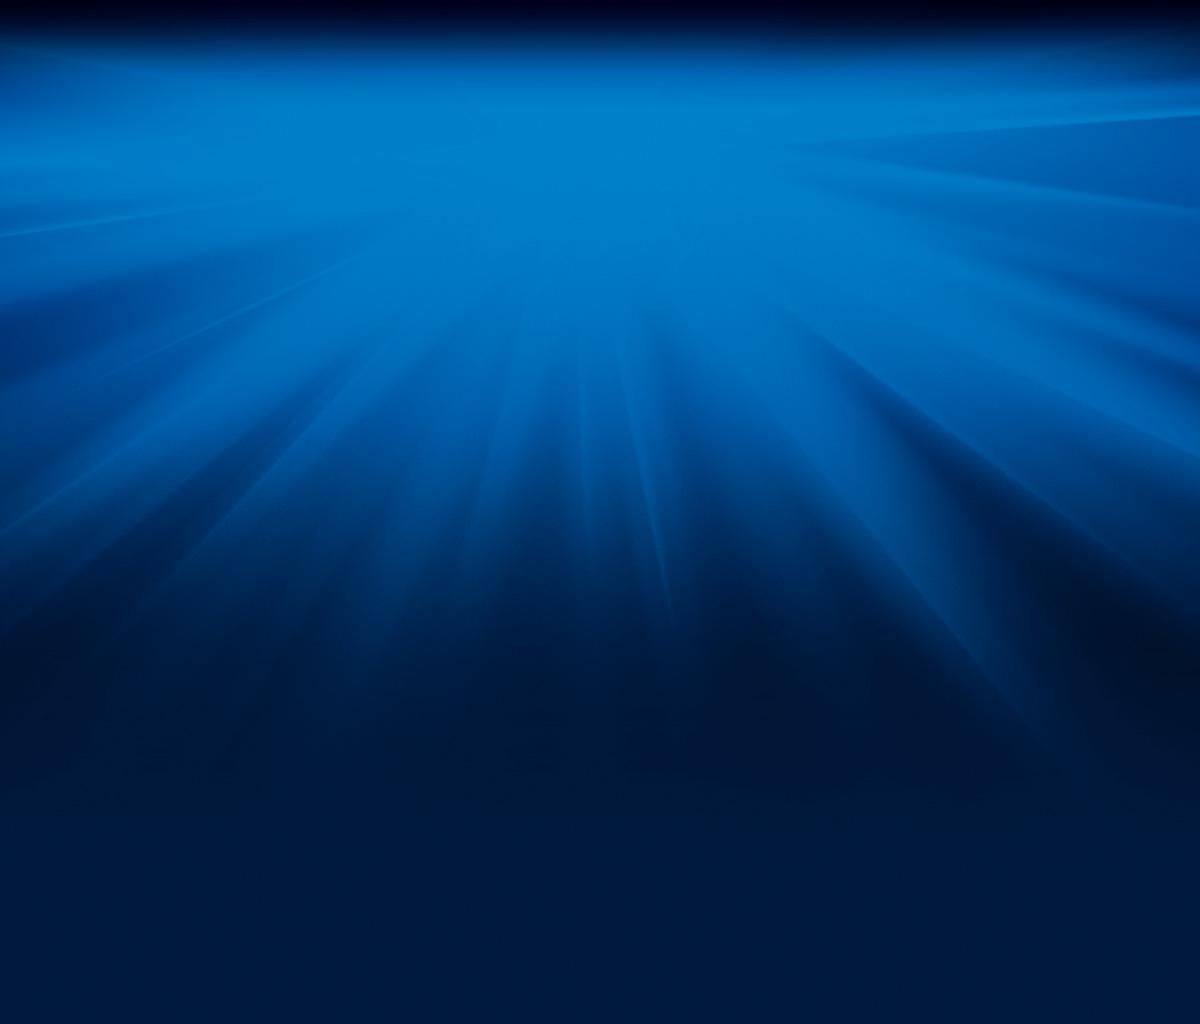 Navy Grasscloth Wallpaper: Navy Blue Wallpapers